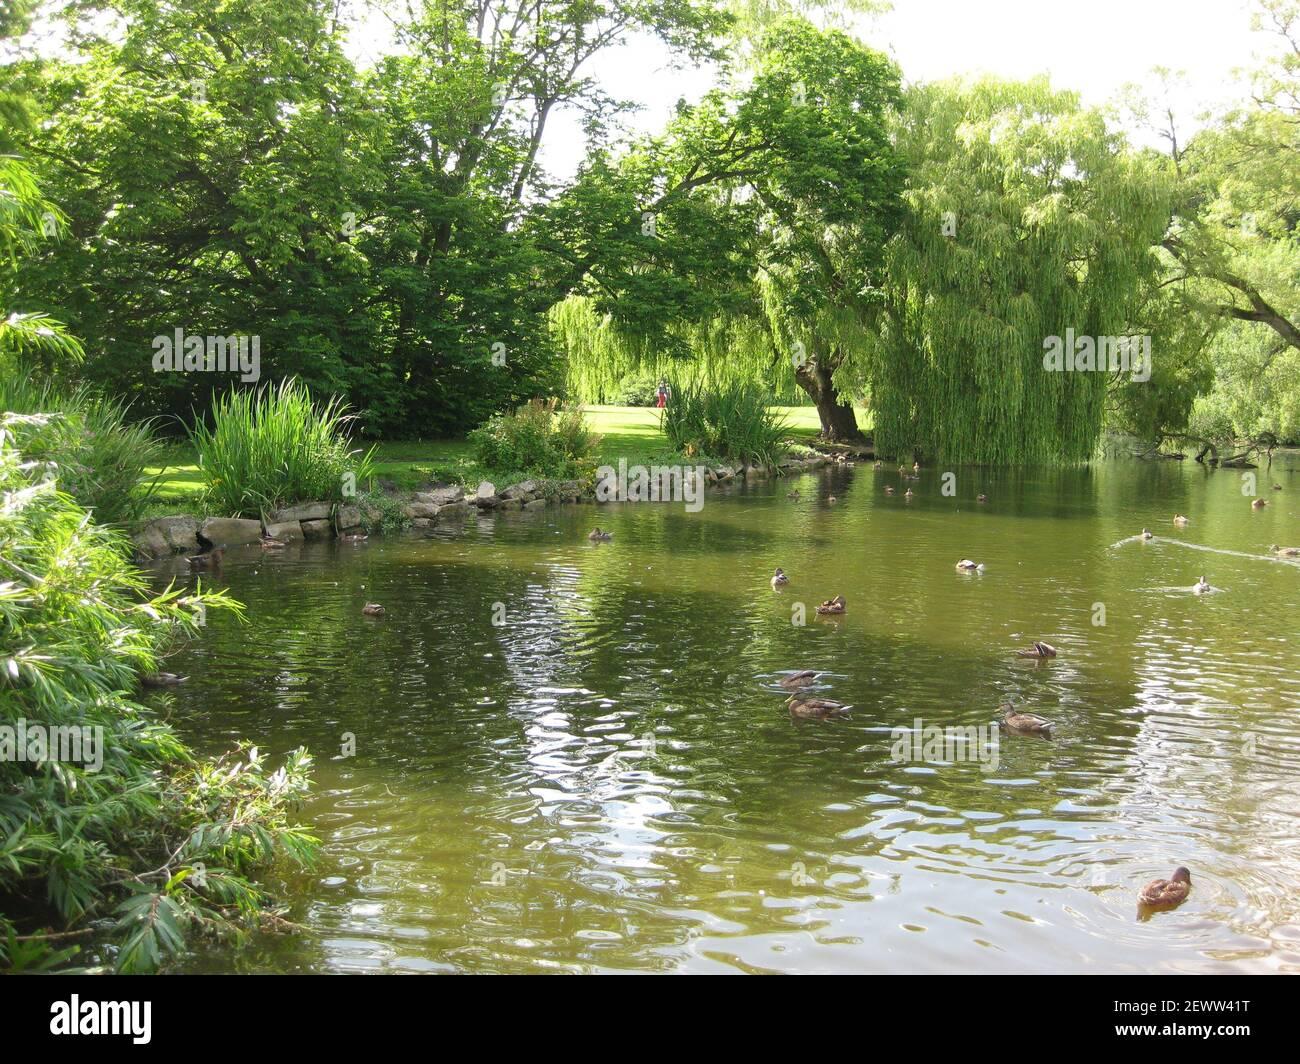 Thwaite Hall Gardens Blick auf den See in Cottingham, East Yorkshire Stockfoto